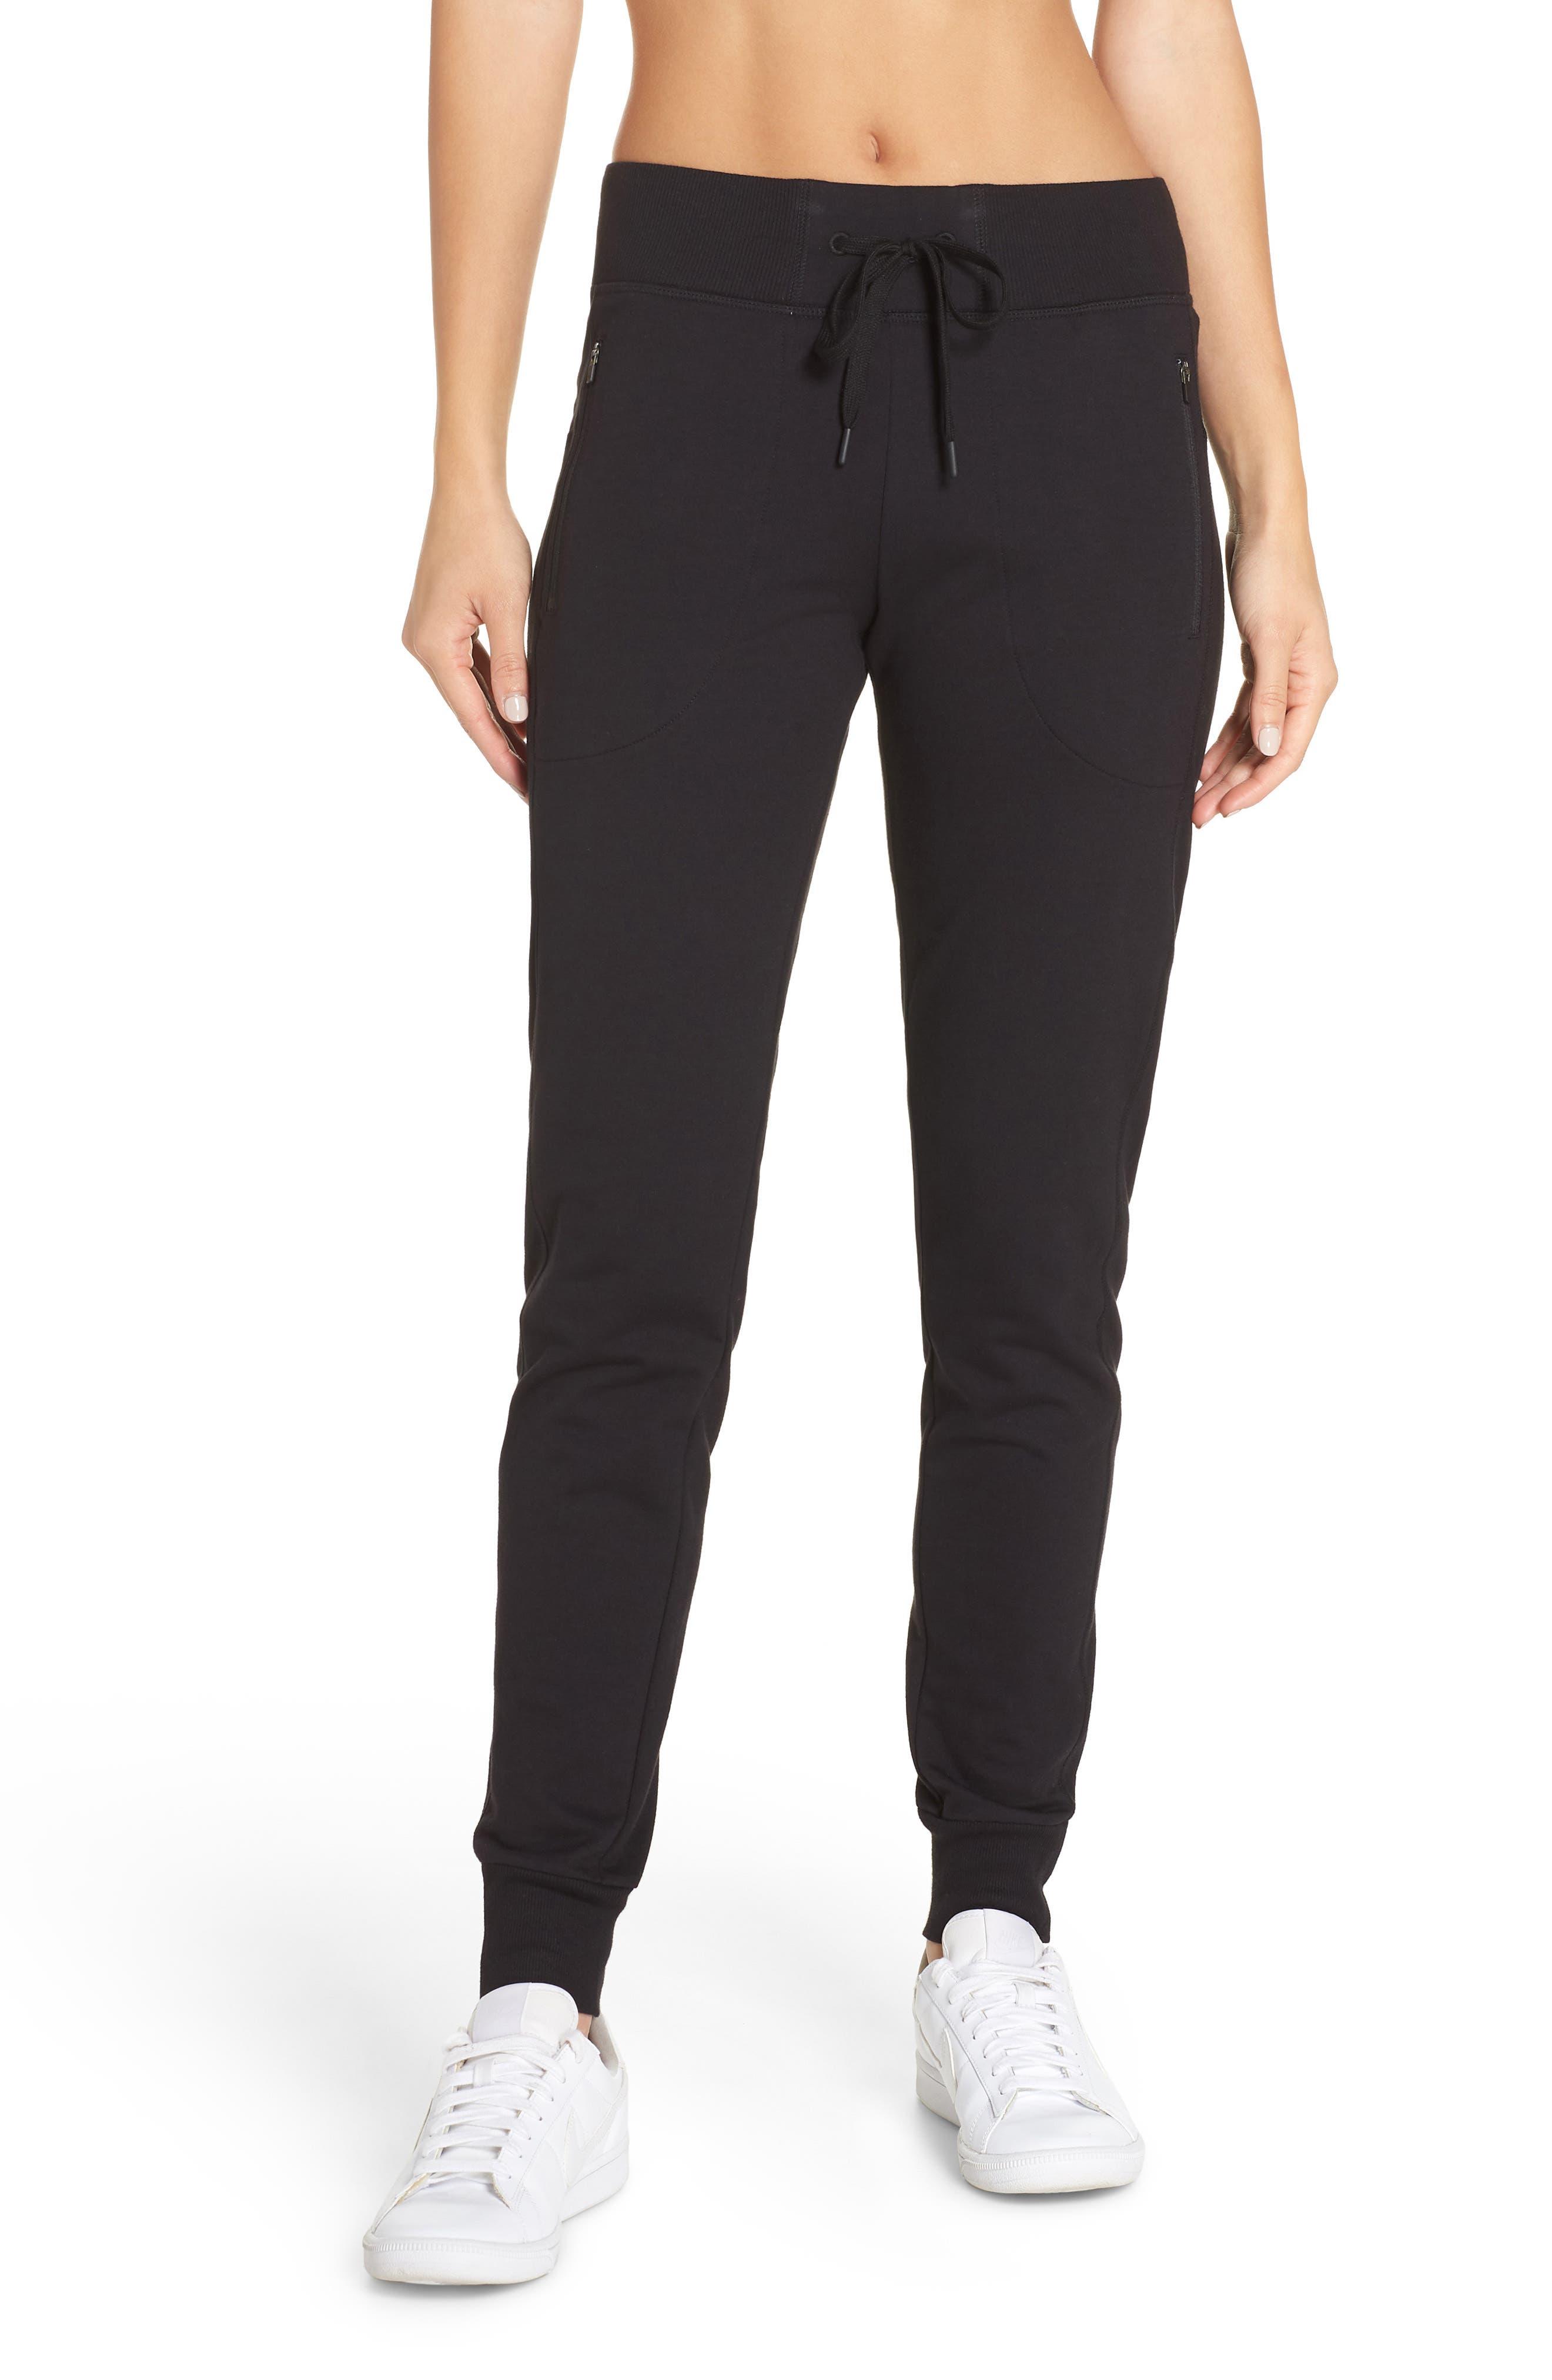 Taryn Sport Knit Pants,                             Main thumbnail 1, color,                             Black